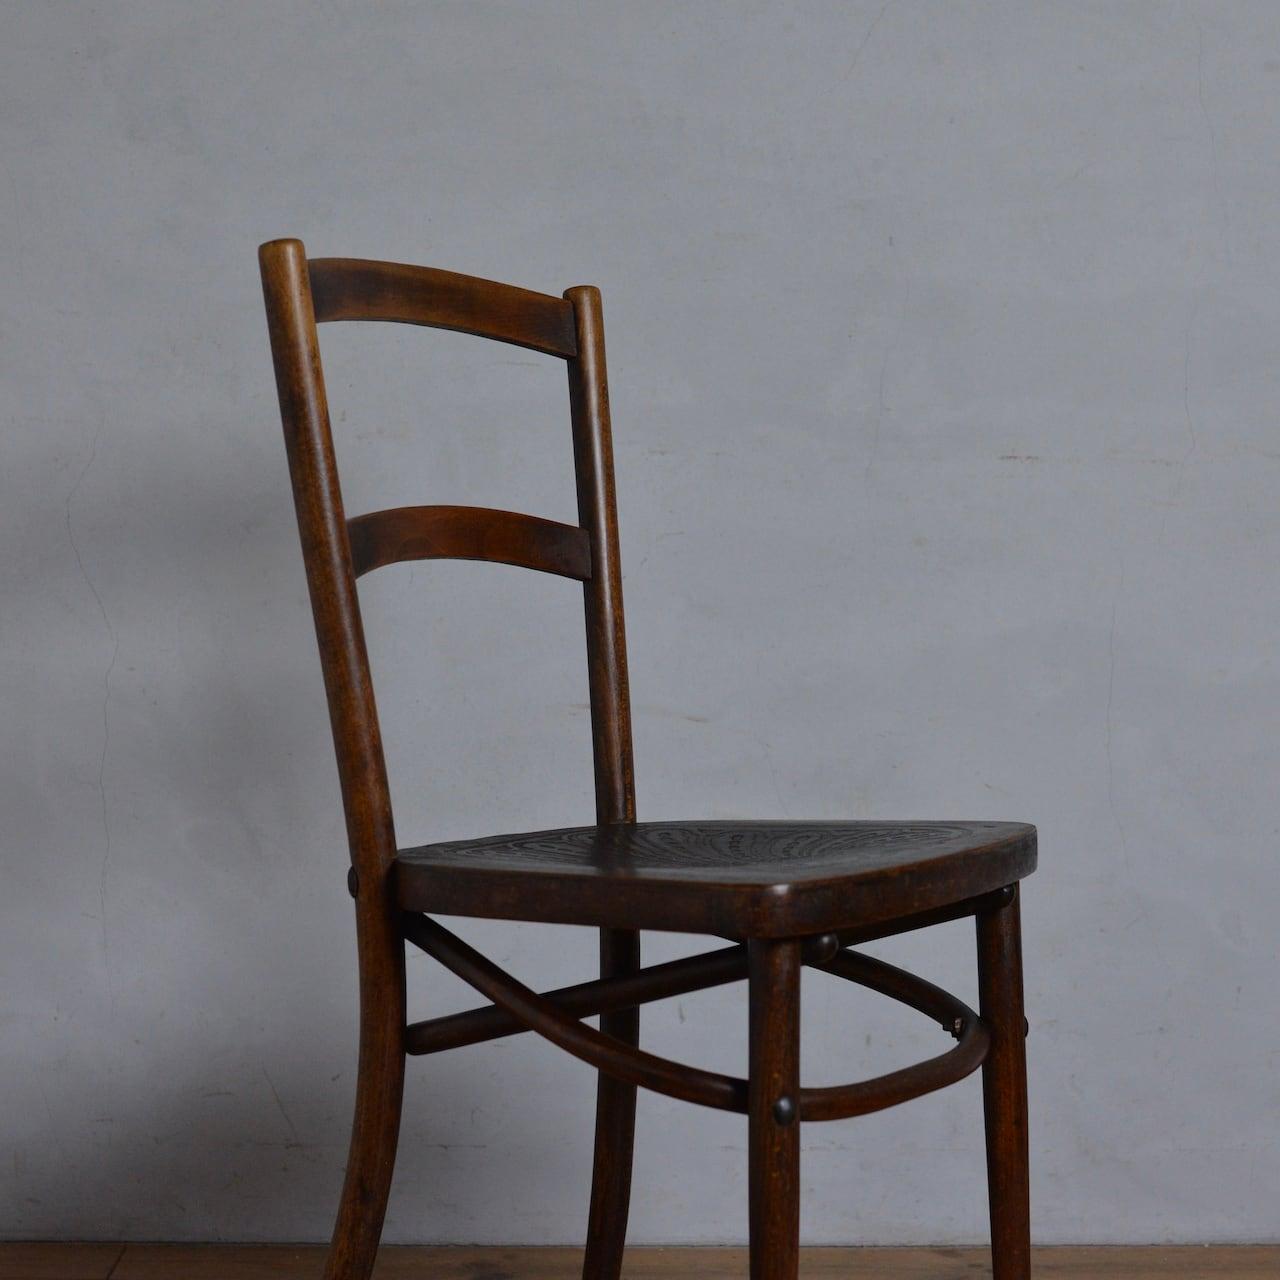 Bentwood Chair / ベントウッドチェア 【B】〈チェア・椅子・ダイニングチェア・デスクチェア・曲木〉SB2012-0002 【B】